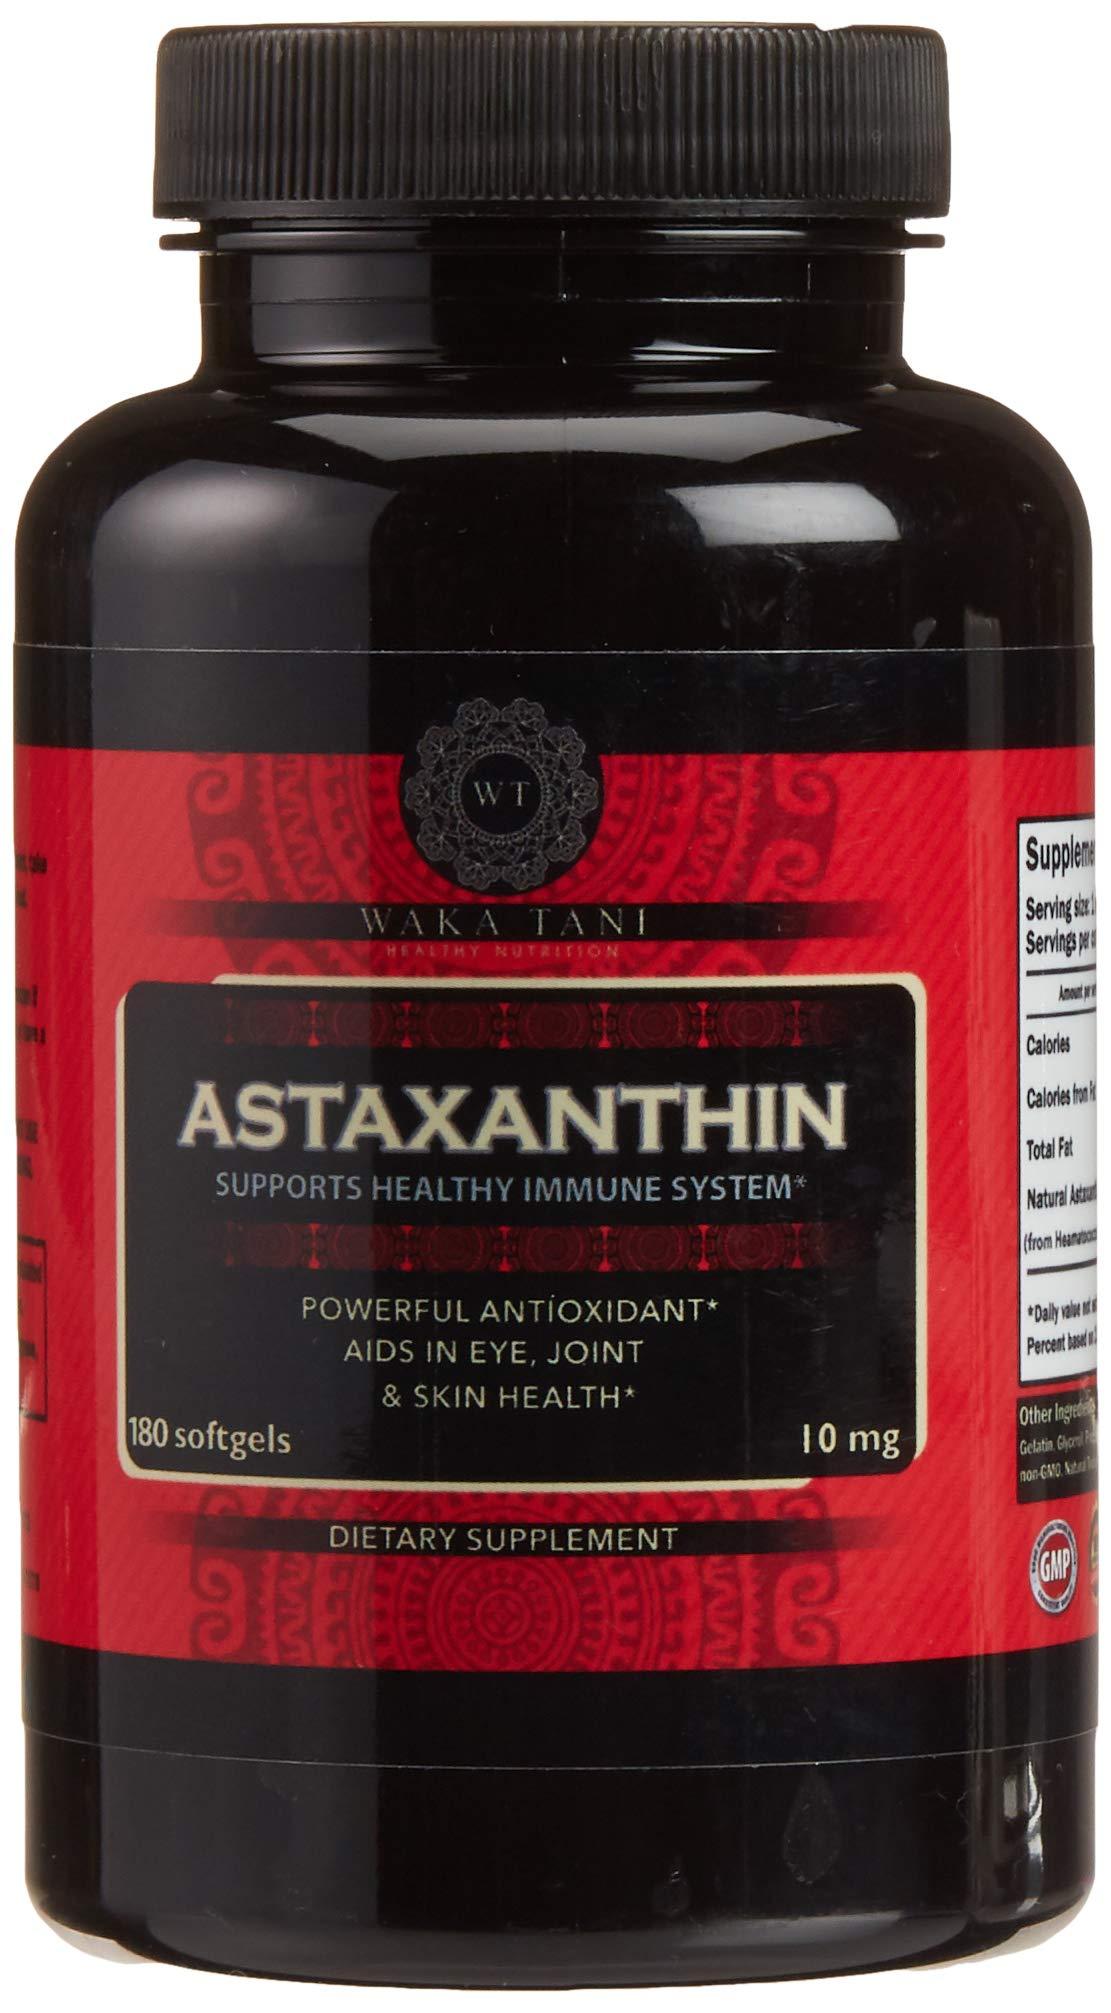 Astaxanthin 10mg 180 Softgels. Powerful Antioxidant & Anti-inflammatory Keto Carotenoid. Natural Algae Supplement. Recommended for: Skin, Joint, Brain, Eye, Cardiovascular & Immune System.